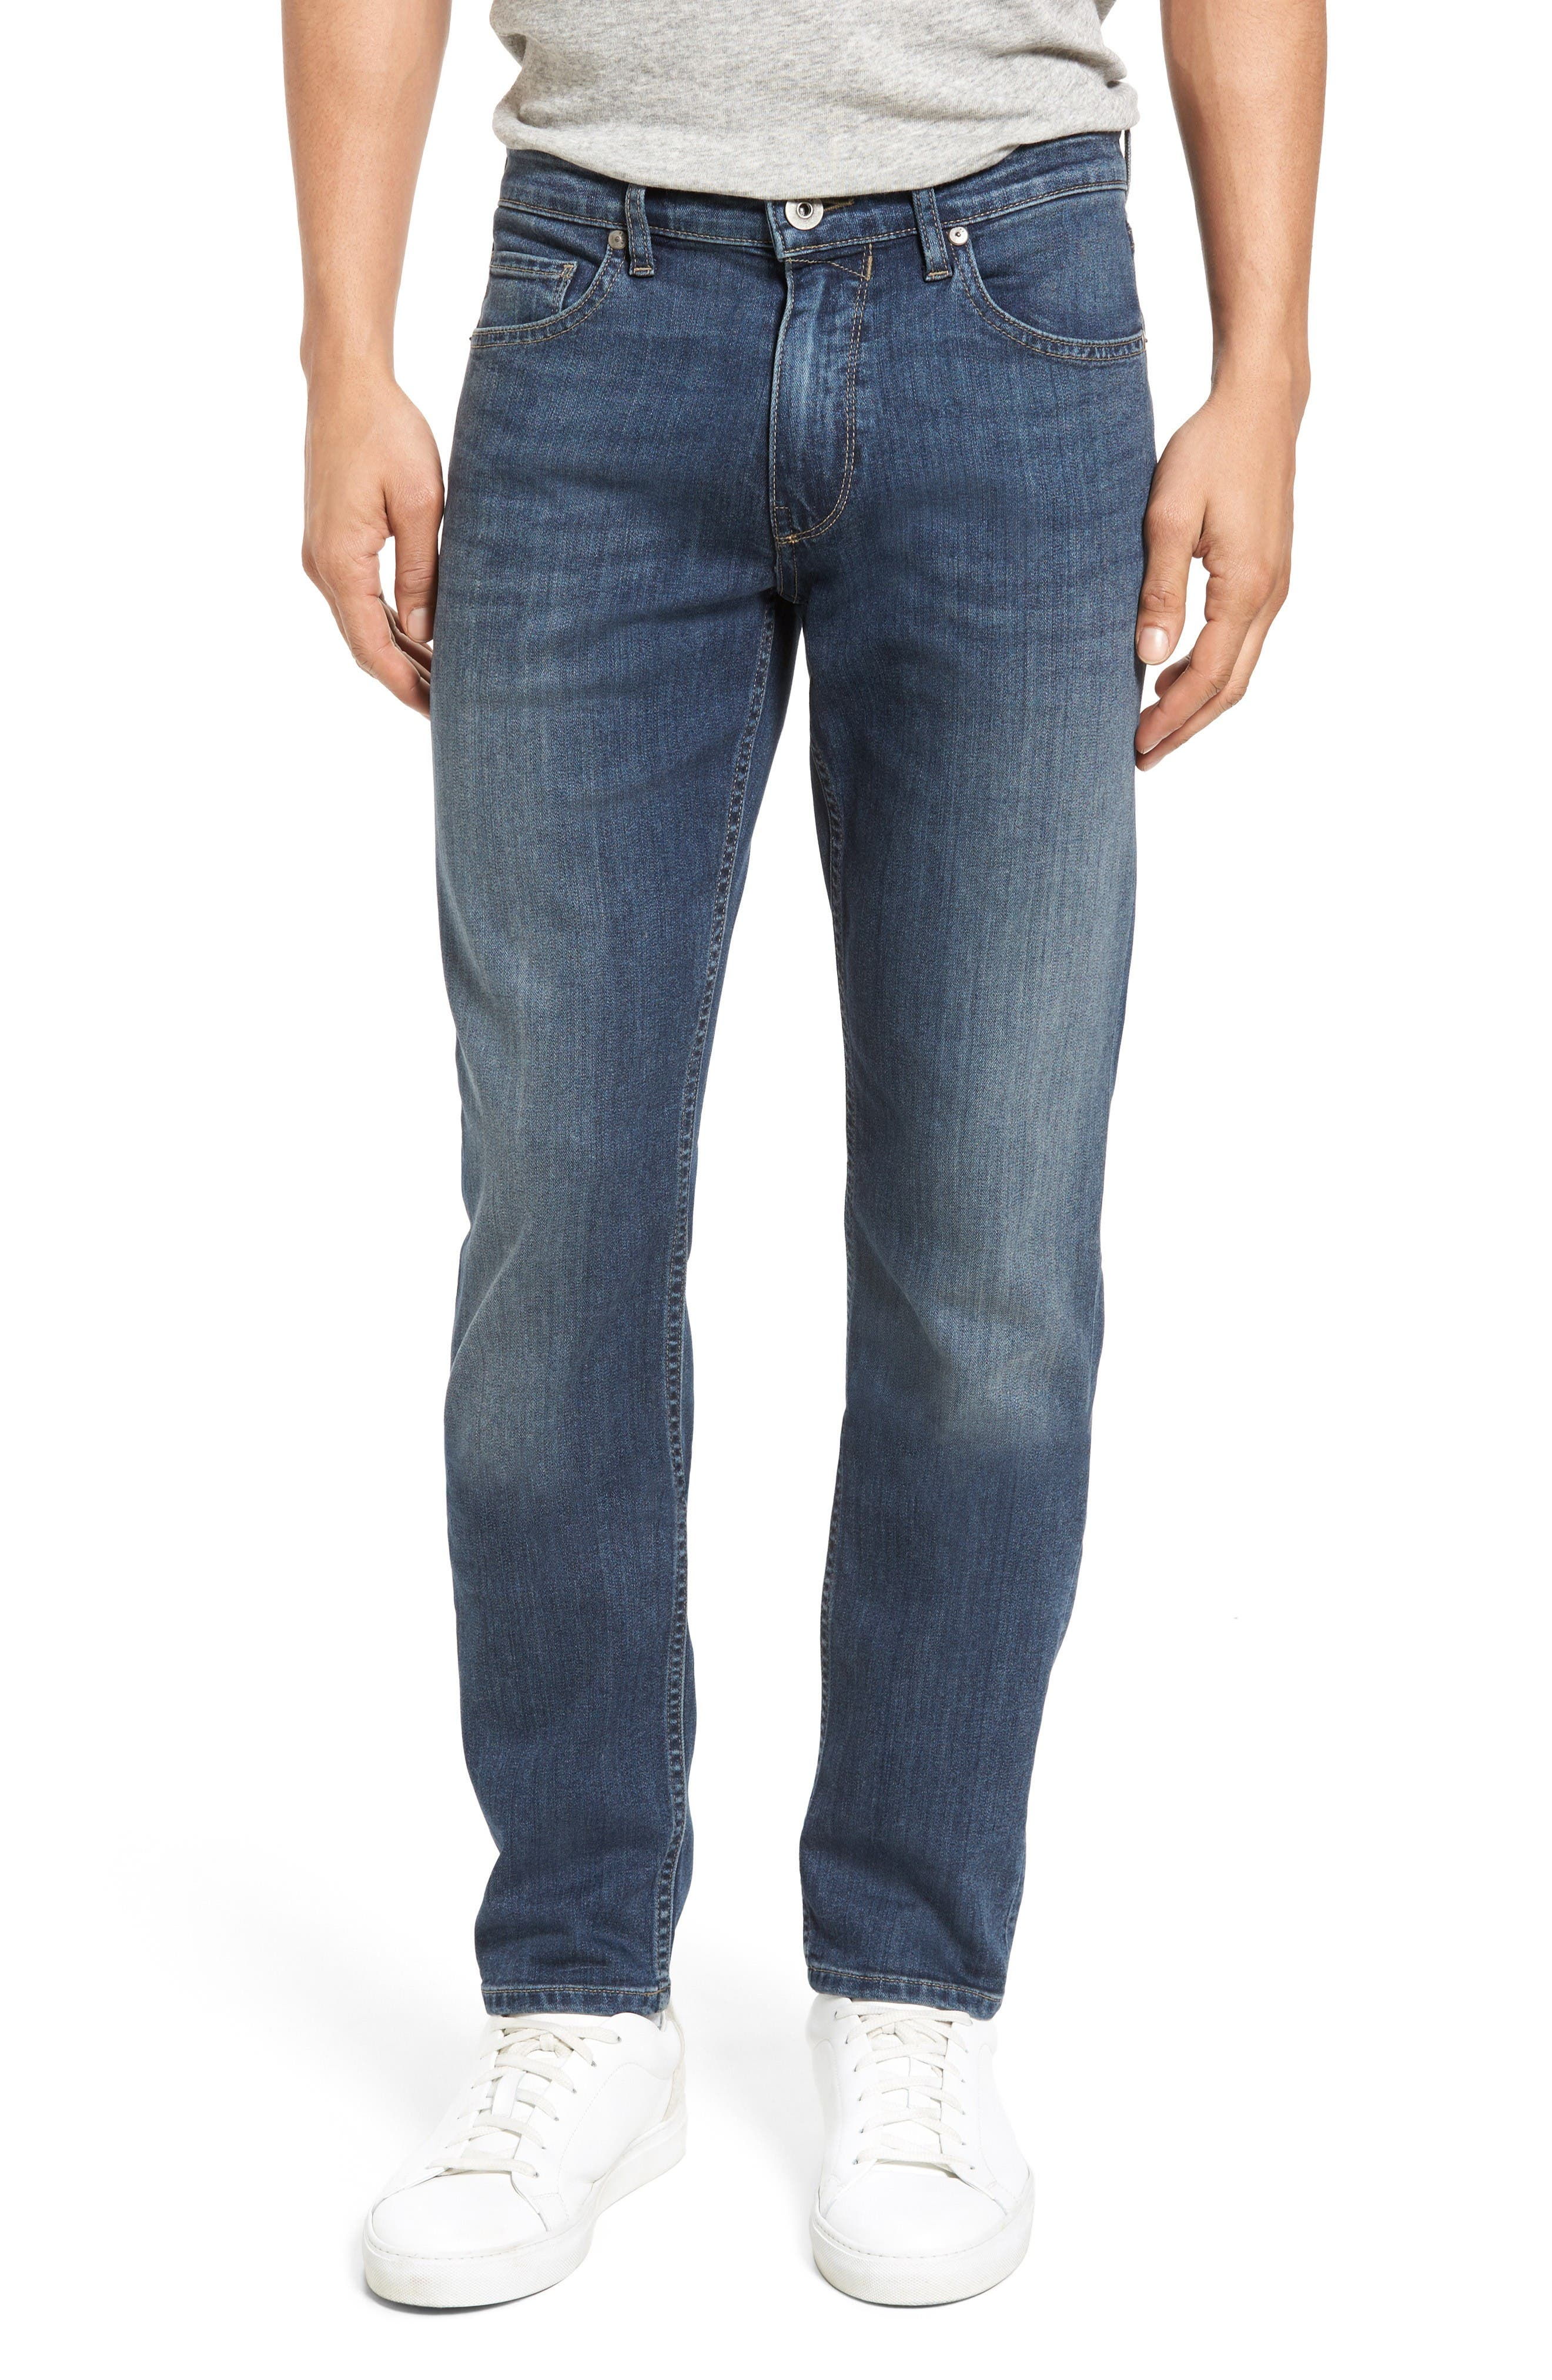 Transcend - Lennox Slim Fit Jeans,                         Main,                         color, Elwood